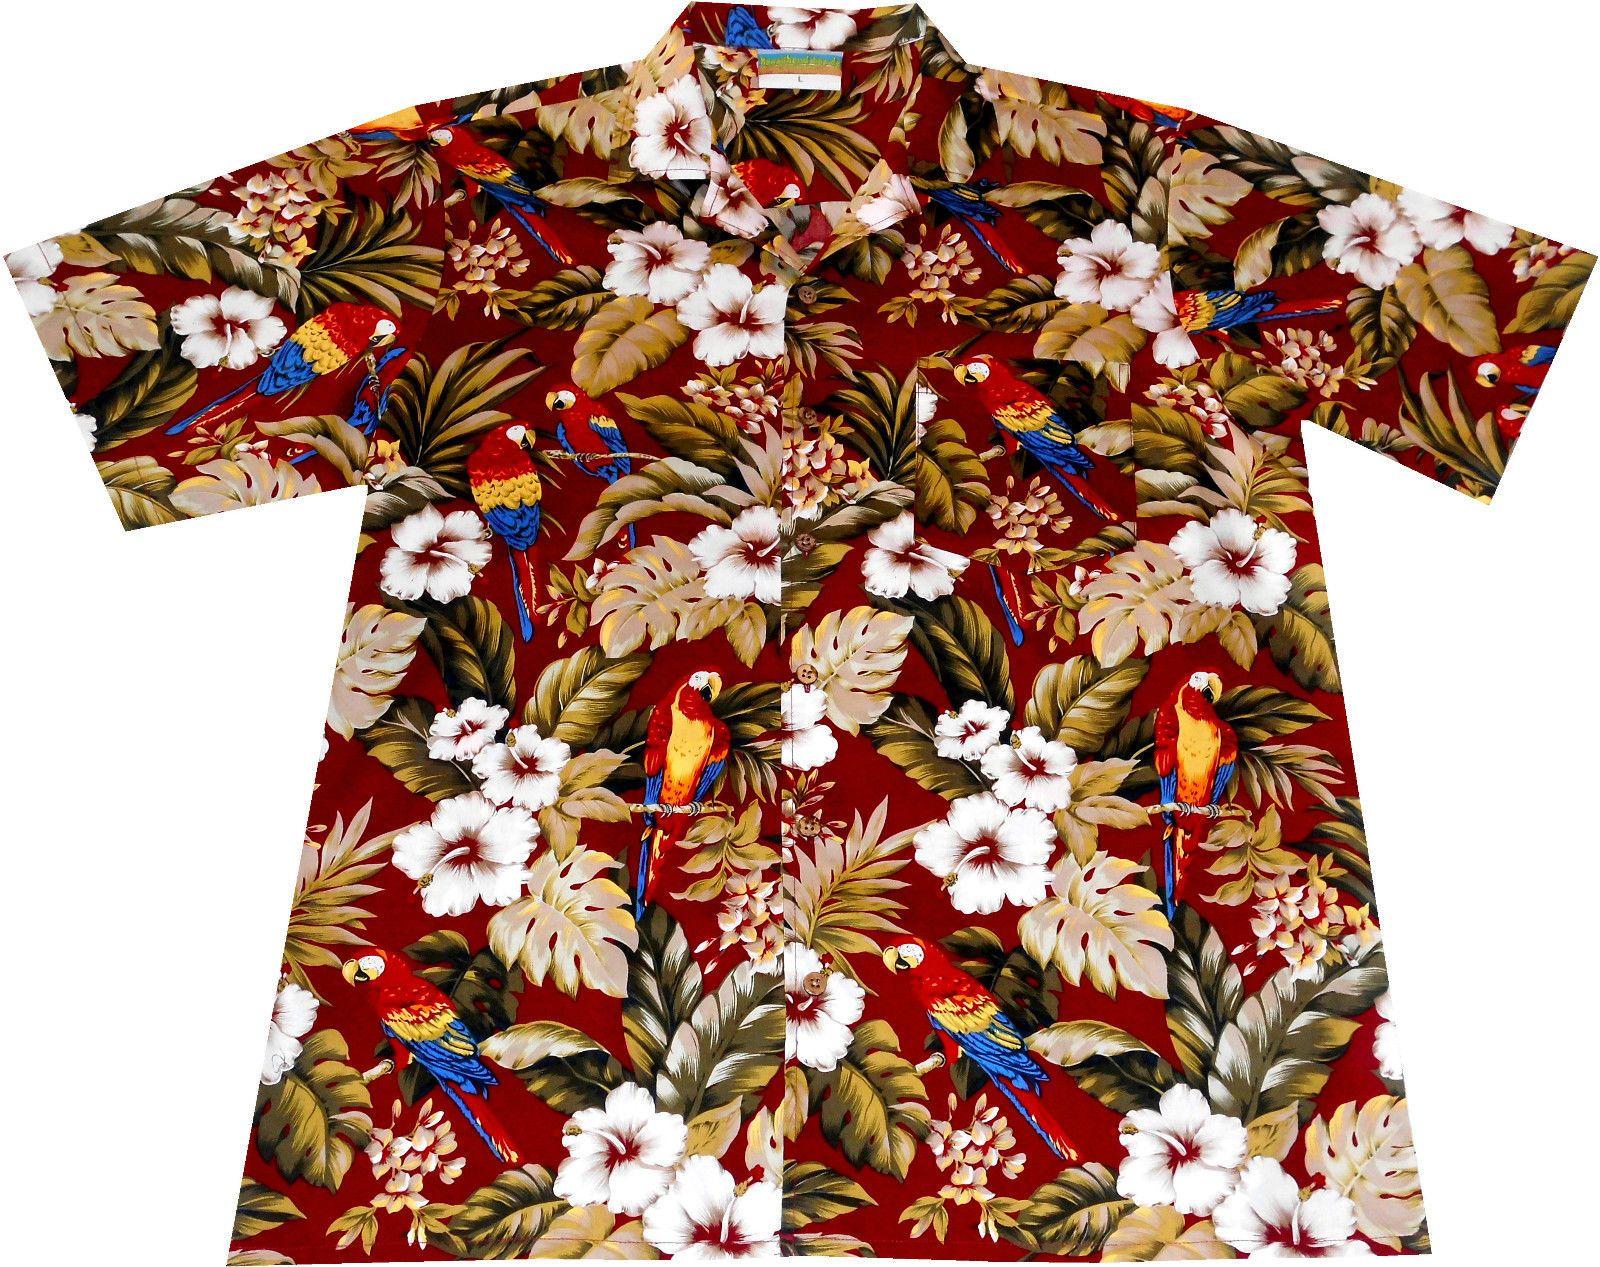 Hawaii Hemd Made in Hawaii Größe S 3XL 100/% Baumwolle Hawaiihemd Blumen rot